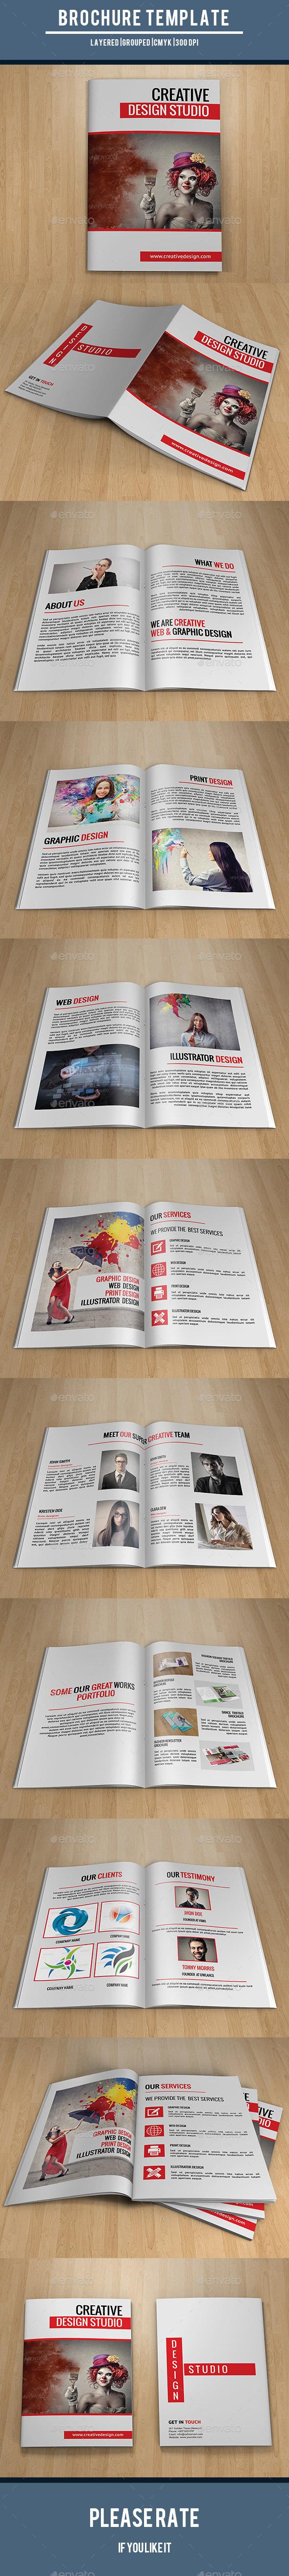 Design Studio Brochure-V185 - Catalogs Brochures